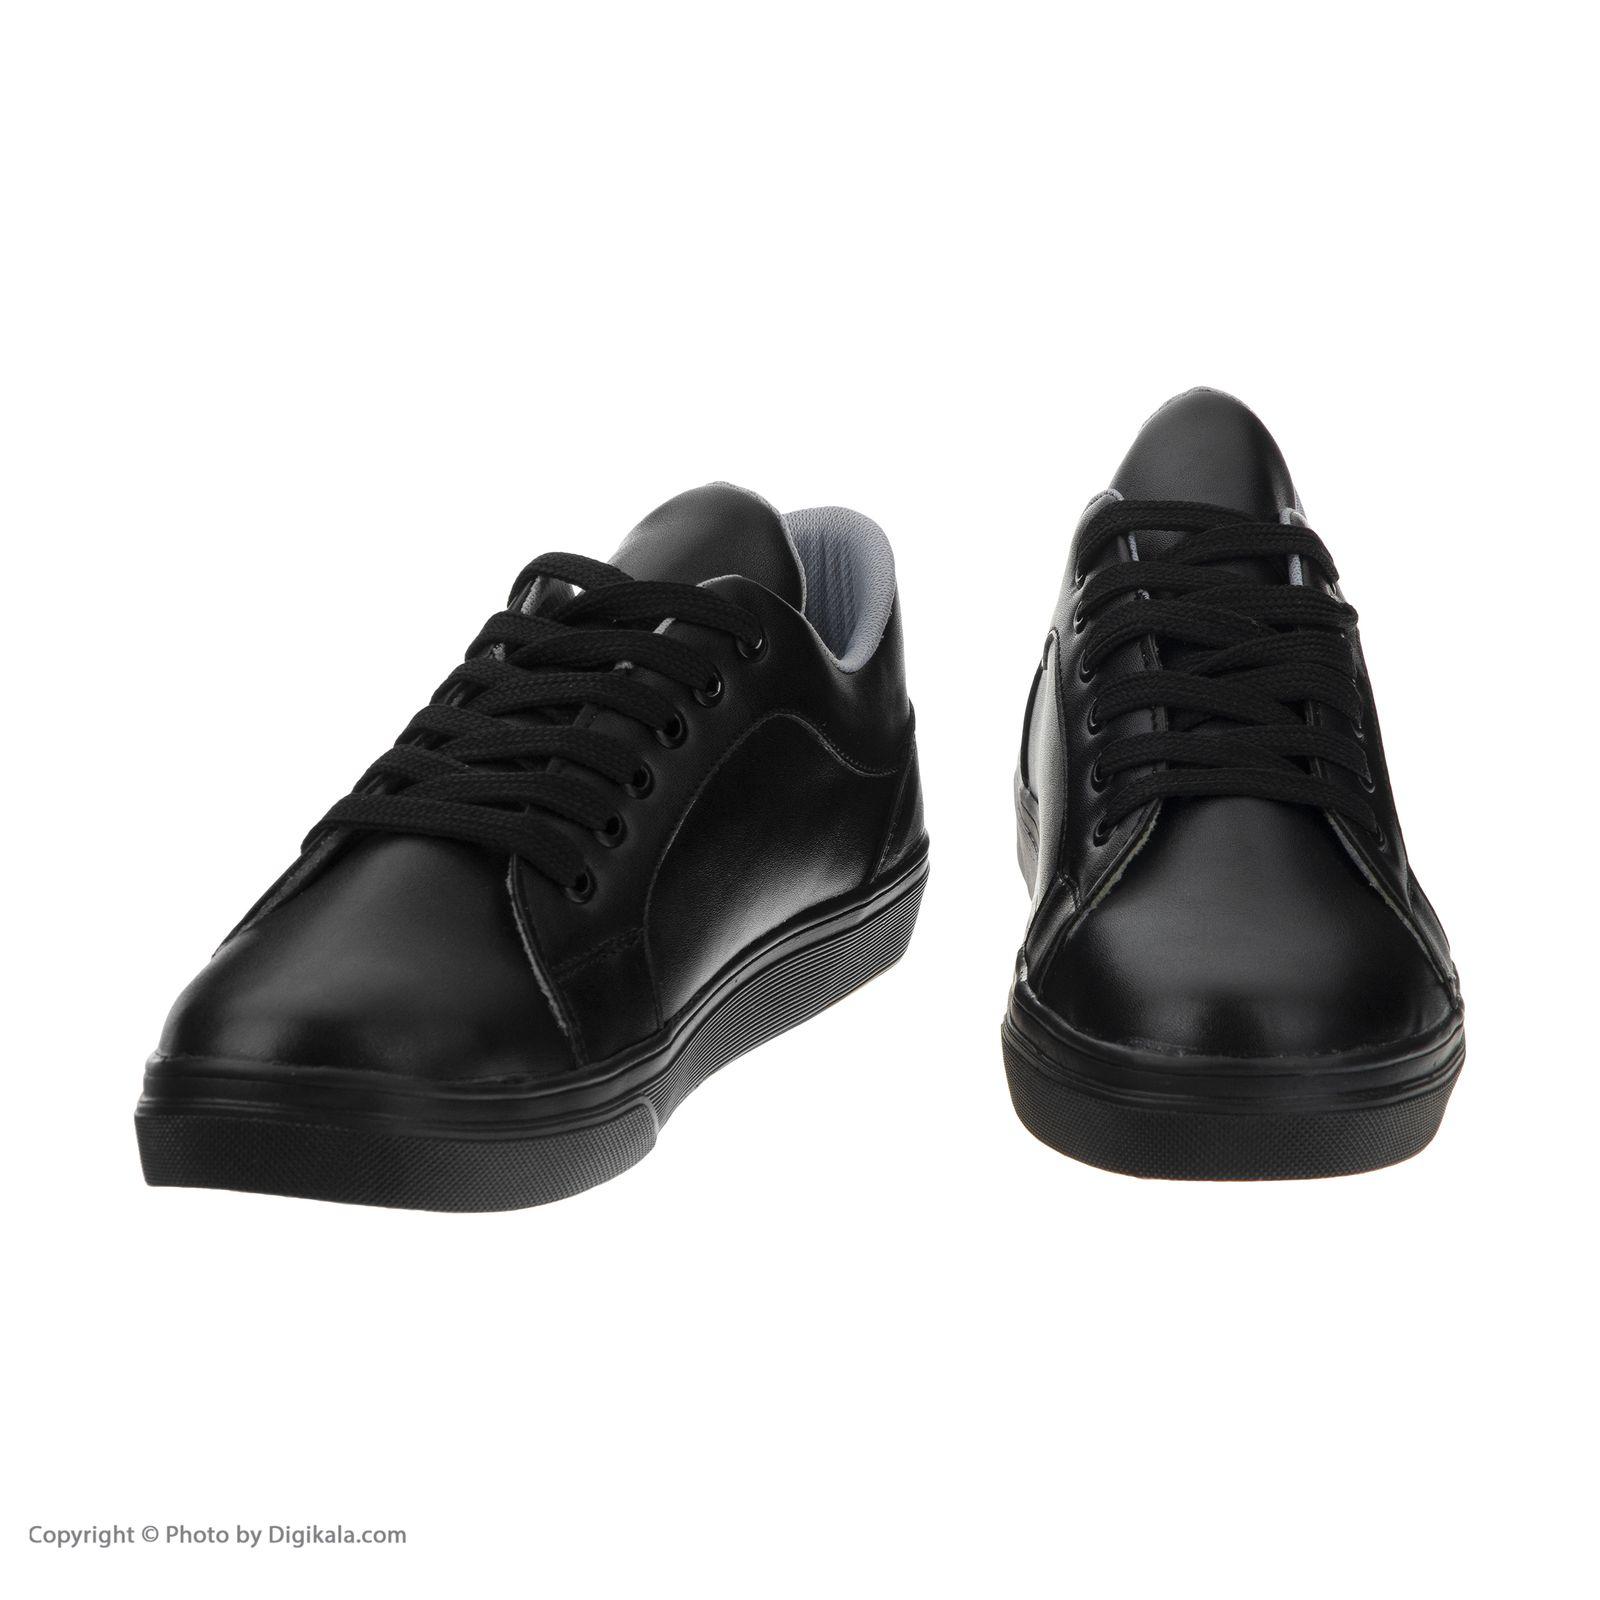 کفش روزمره زنانه مدل 4031 -  - 4